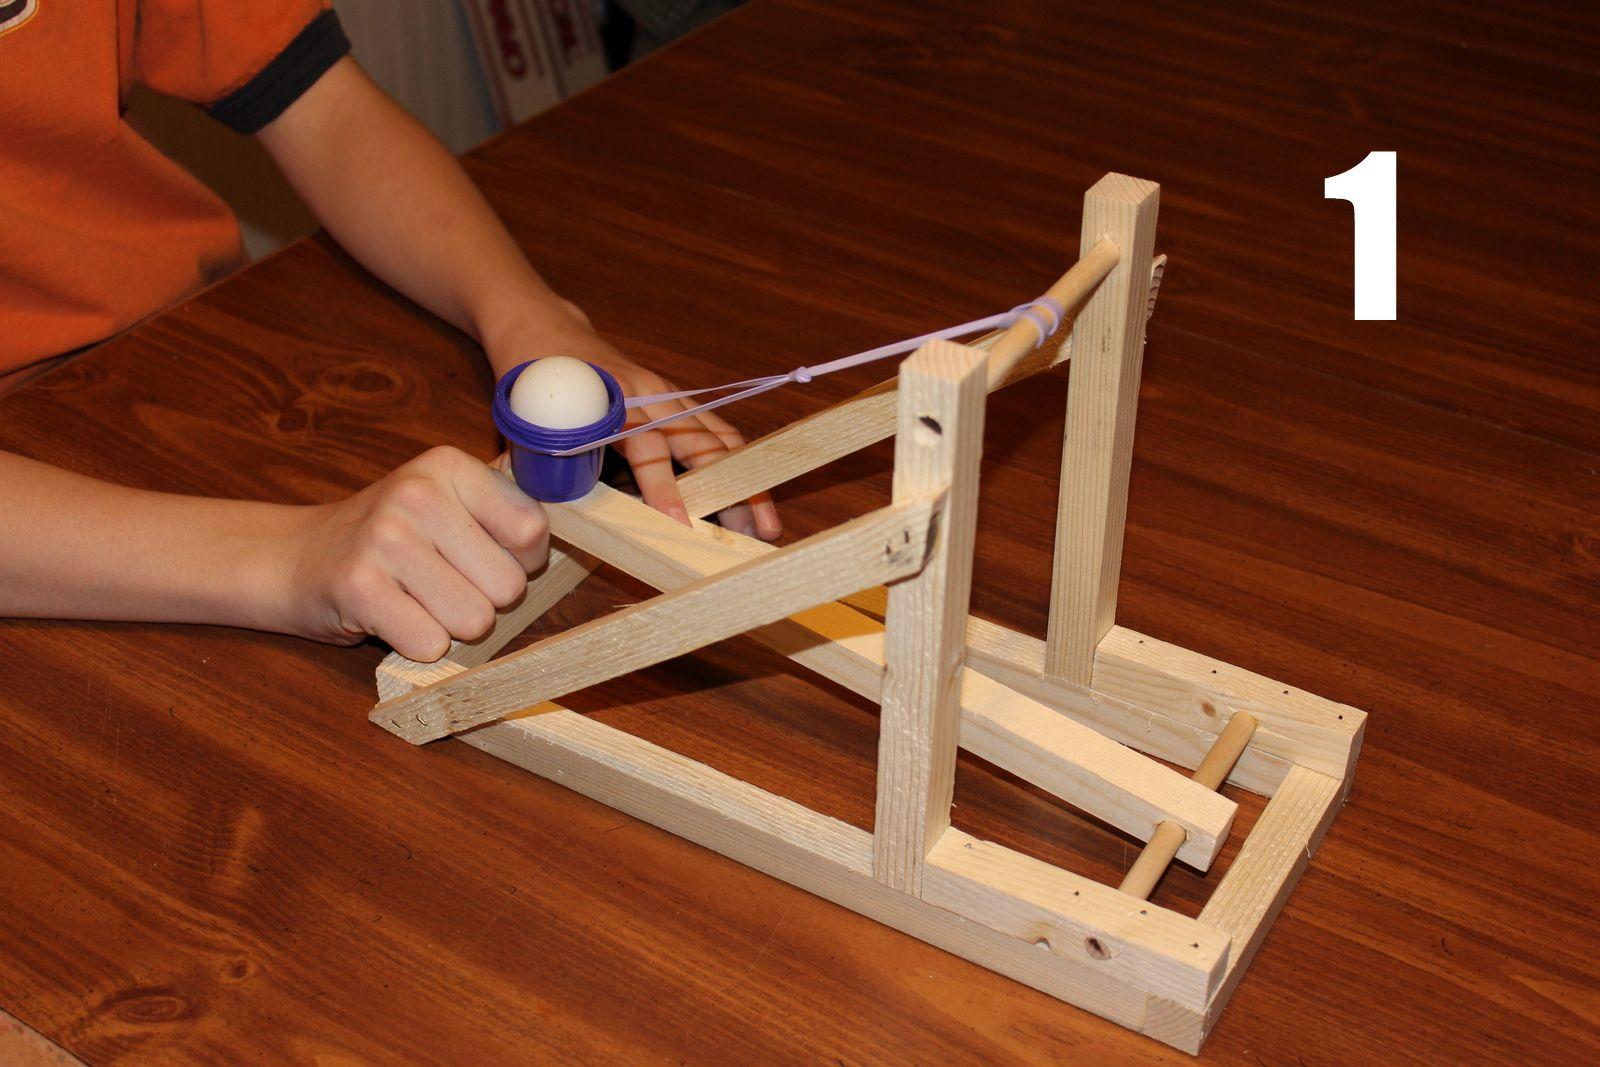 Catapult Kit 1 Pre Cut Parts Wooden Model 12 Long Models Ebay